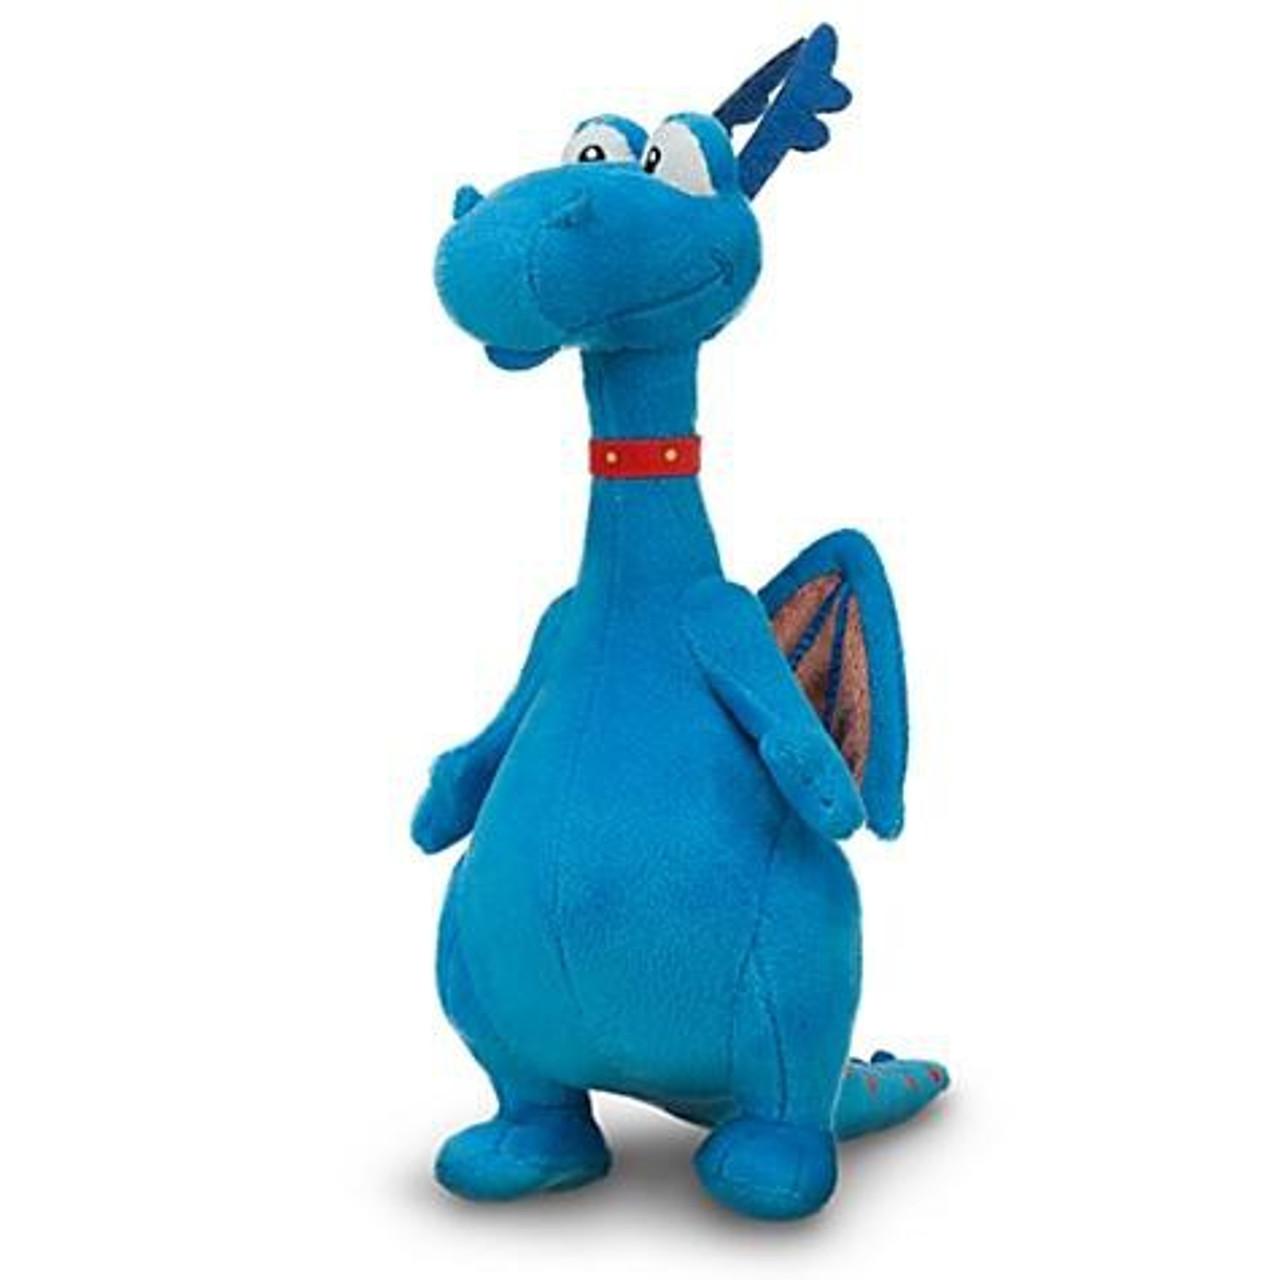 Disney Doc McStuffins Stuffy Exclusive 8.5-Inch Plush [Blue Dragon]